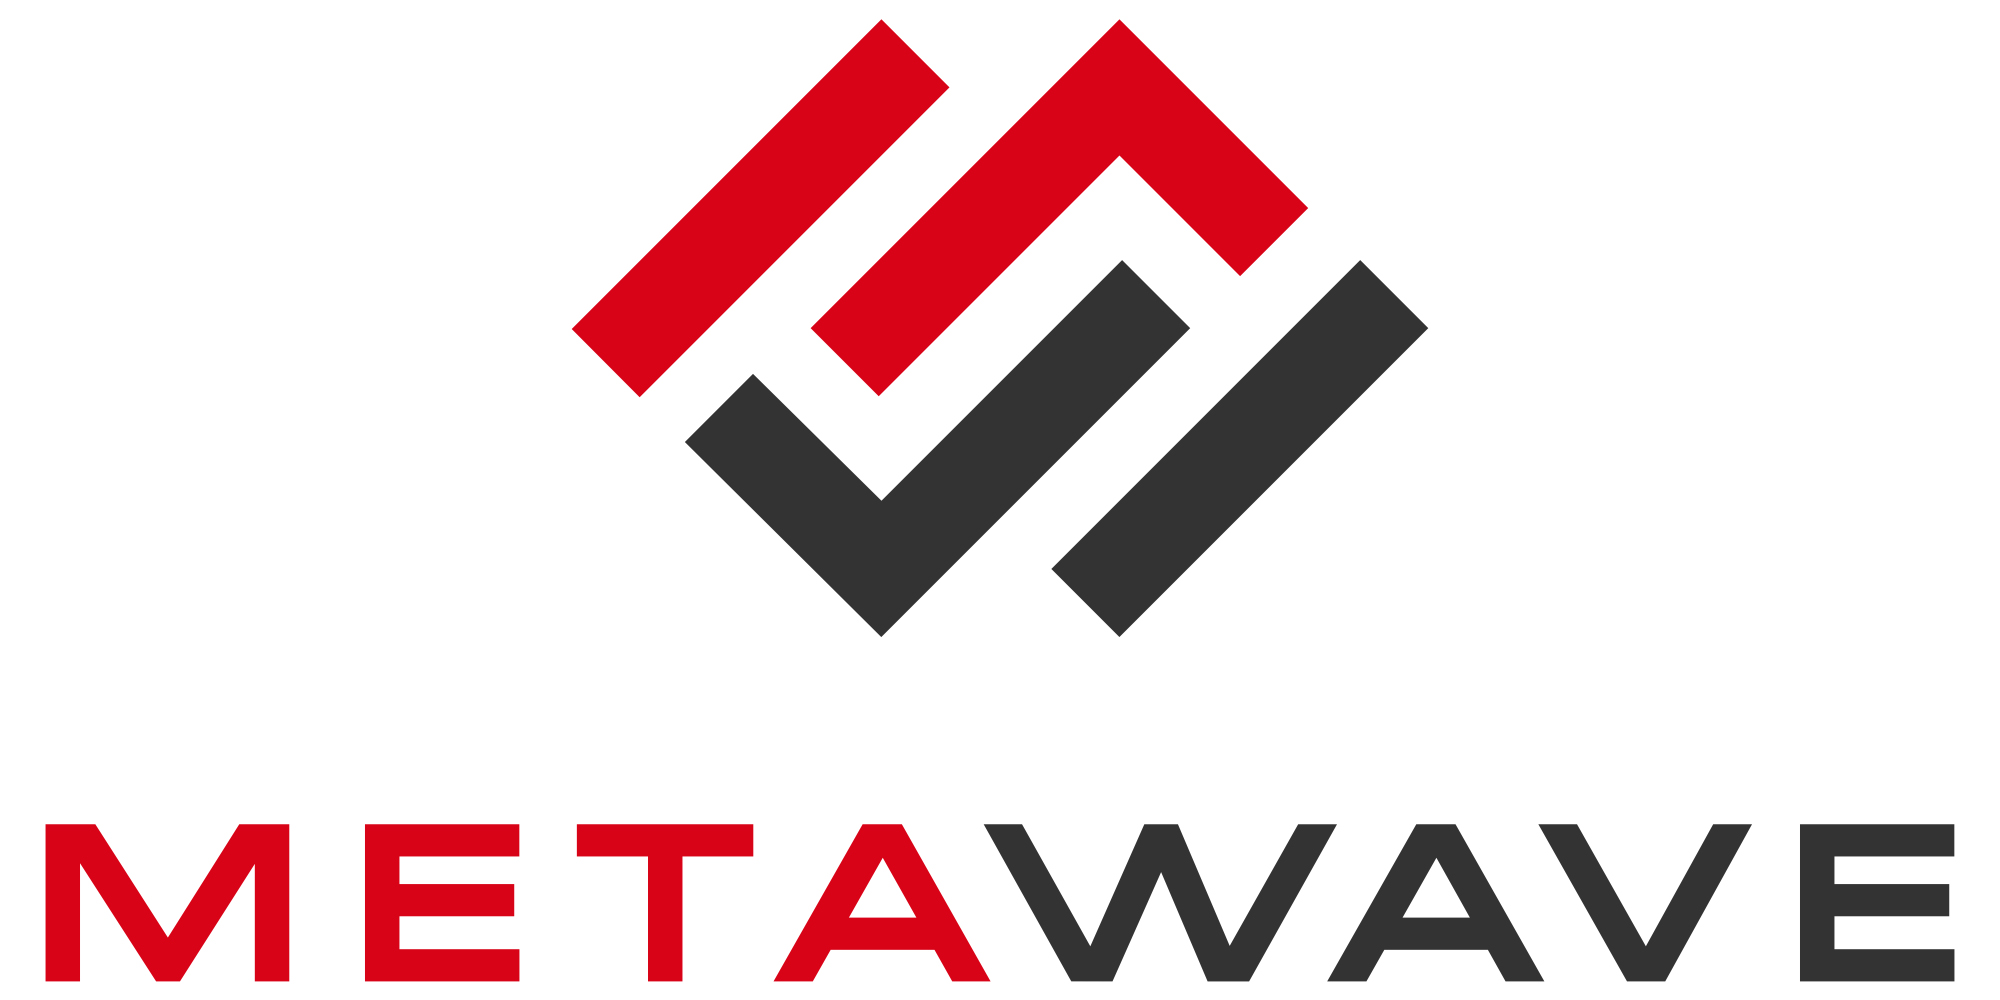 Metawave Corporation